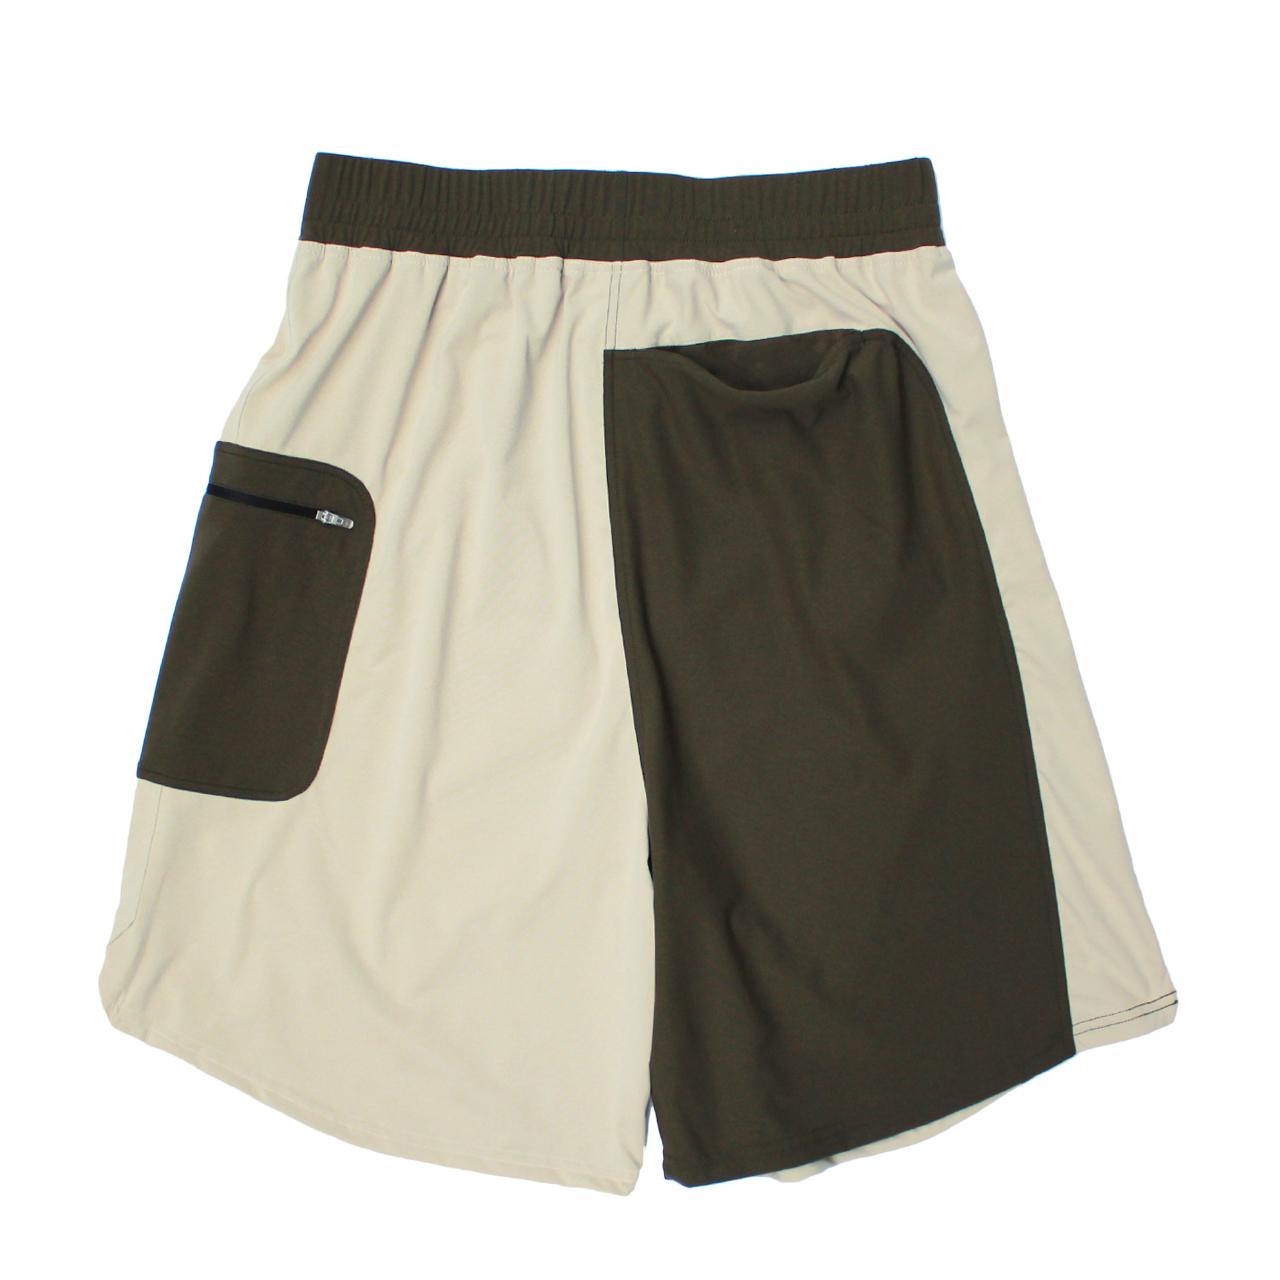 LOGO street shorts <Khaki×Beige>  - 画像2